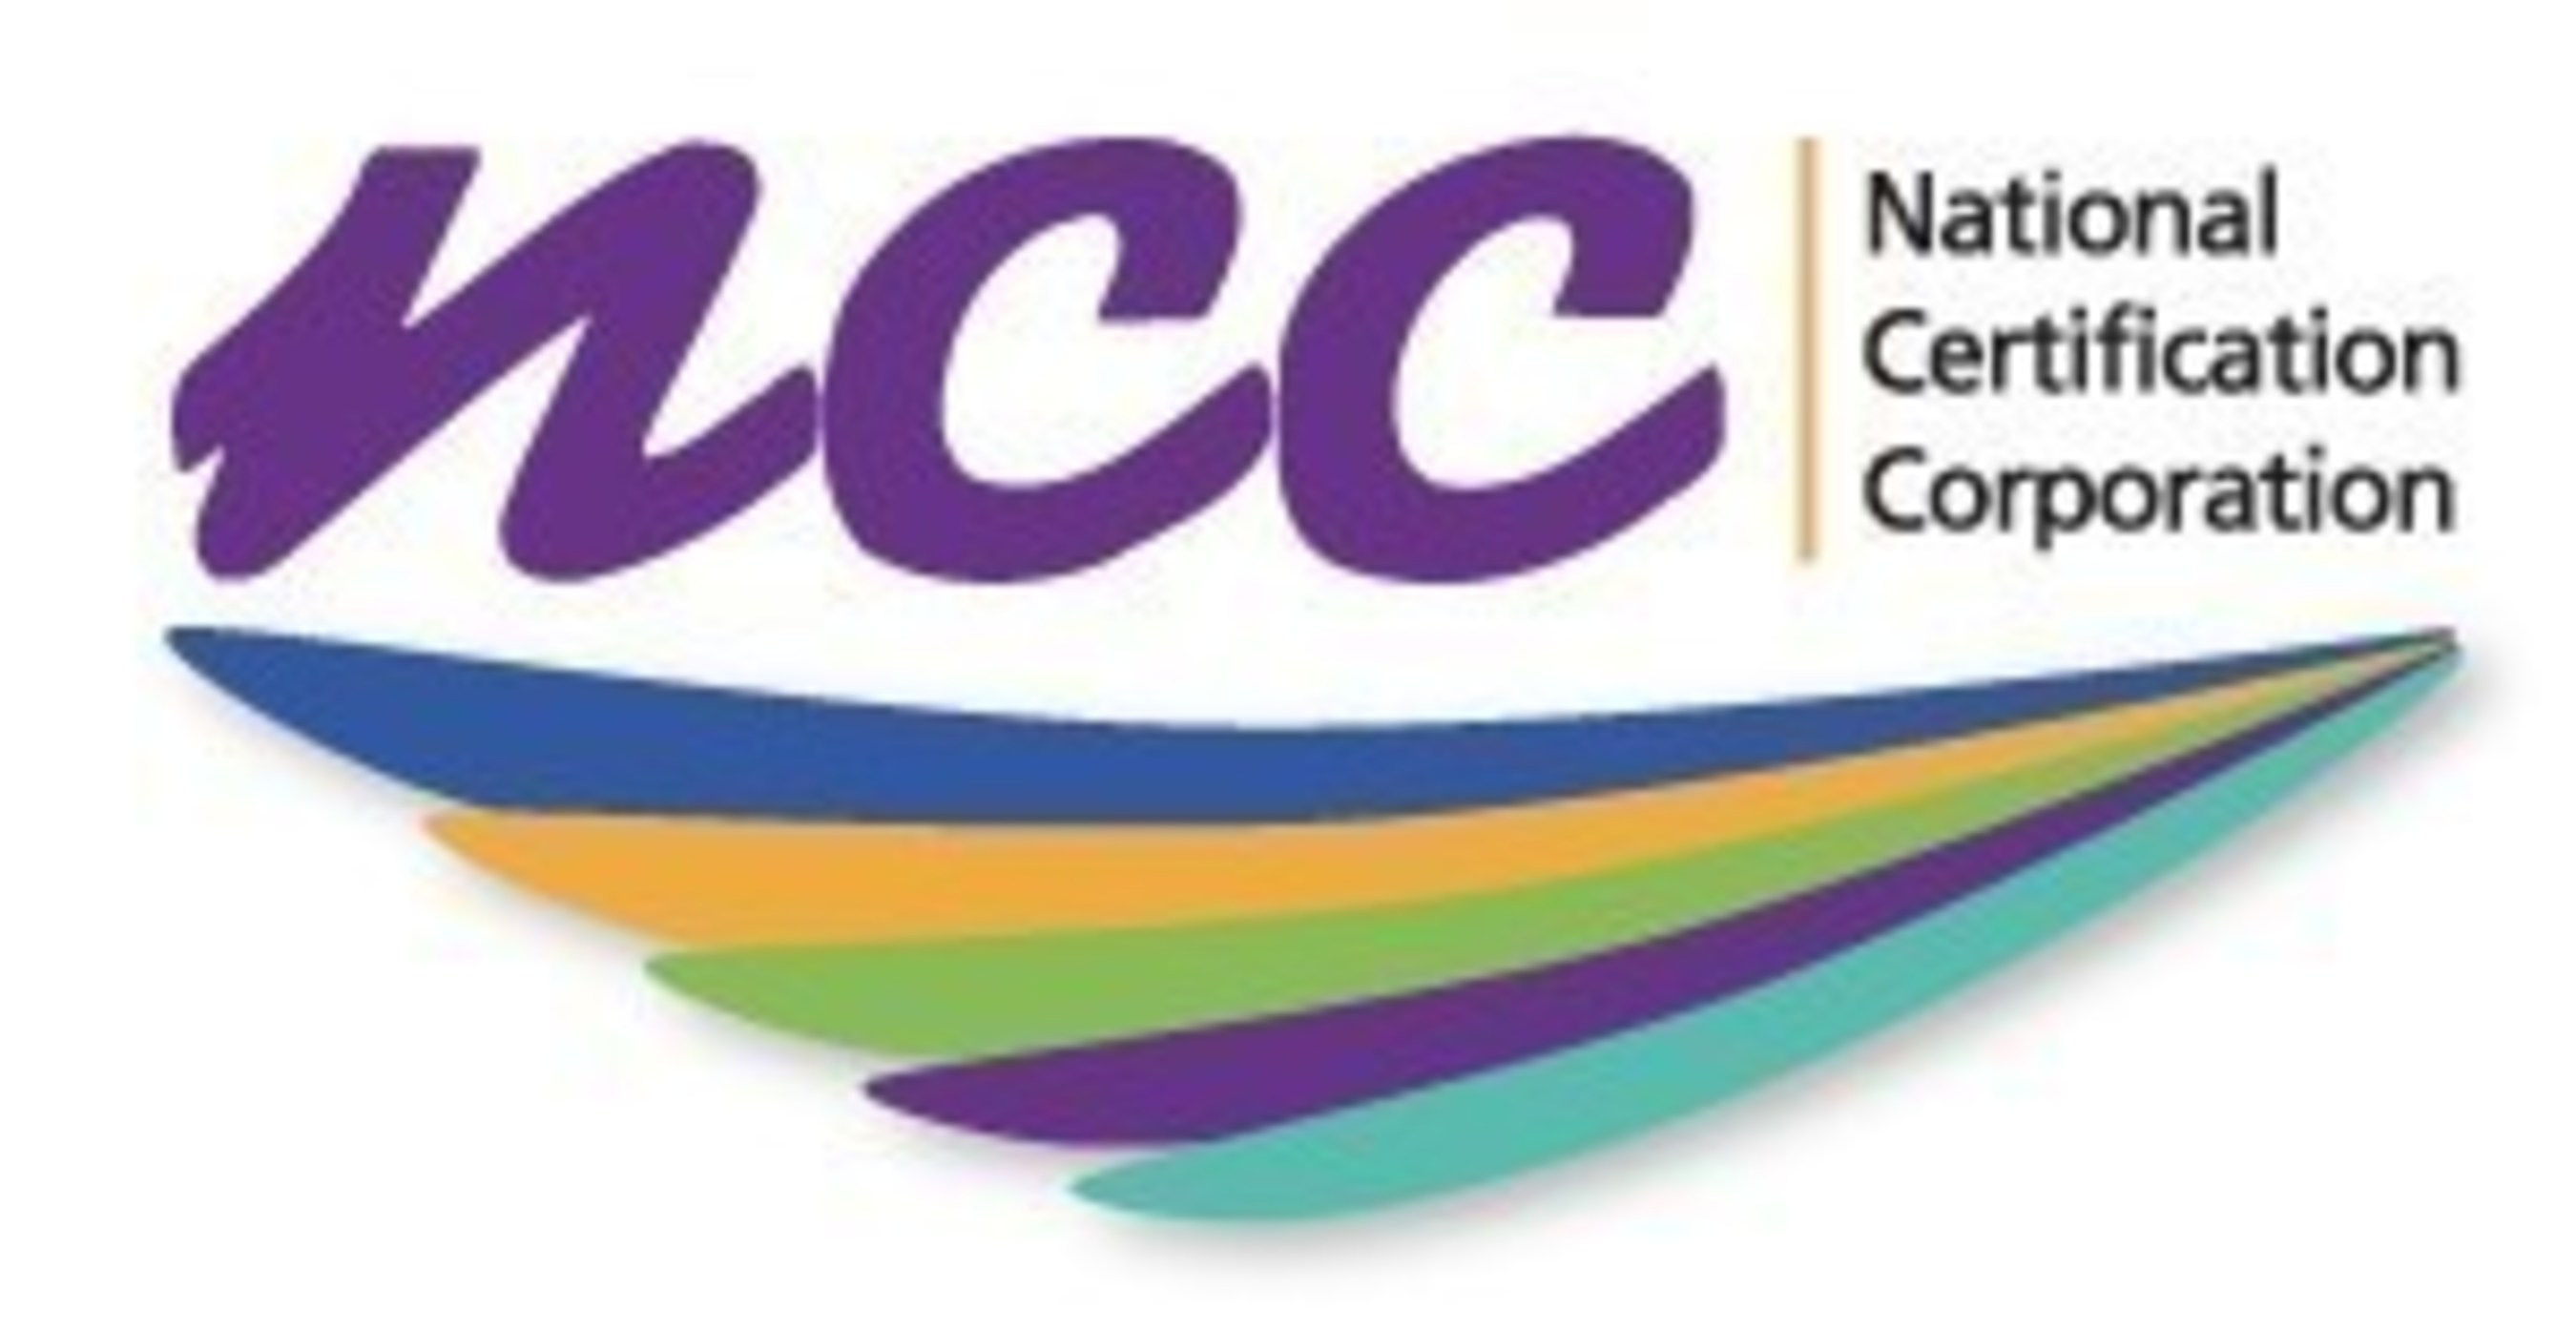 National Certification Corporation Logo